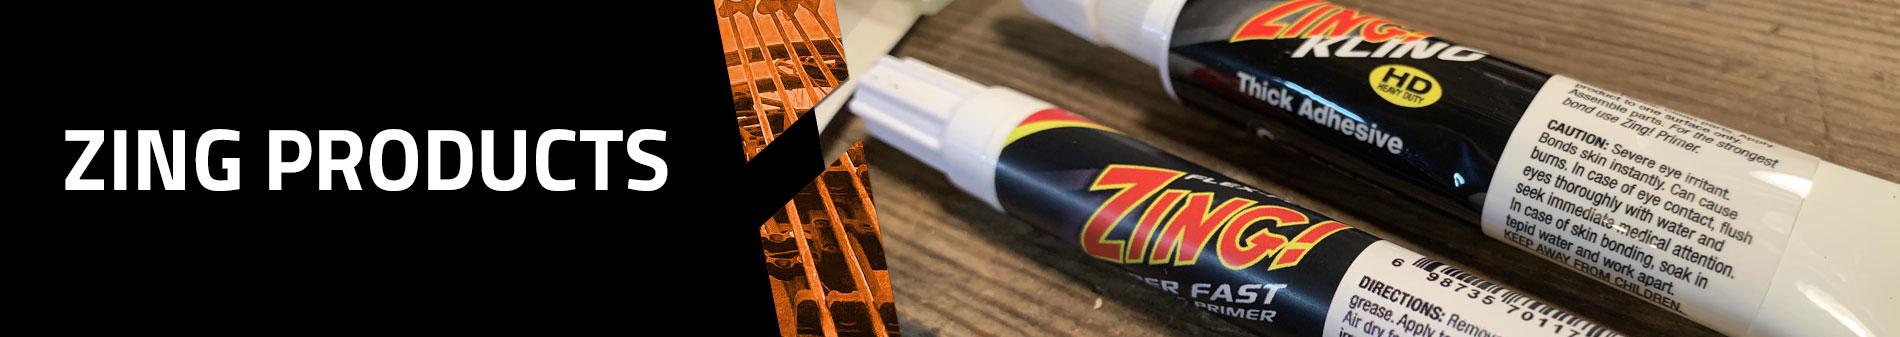 Zing & Flex-Bond Adhesives - Fletching Glue